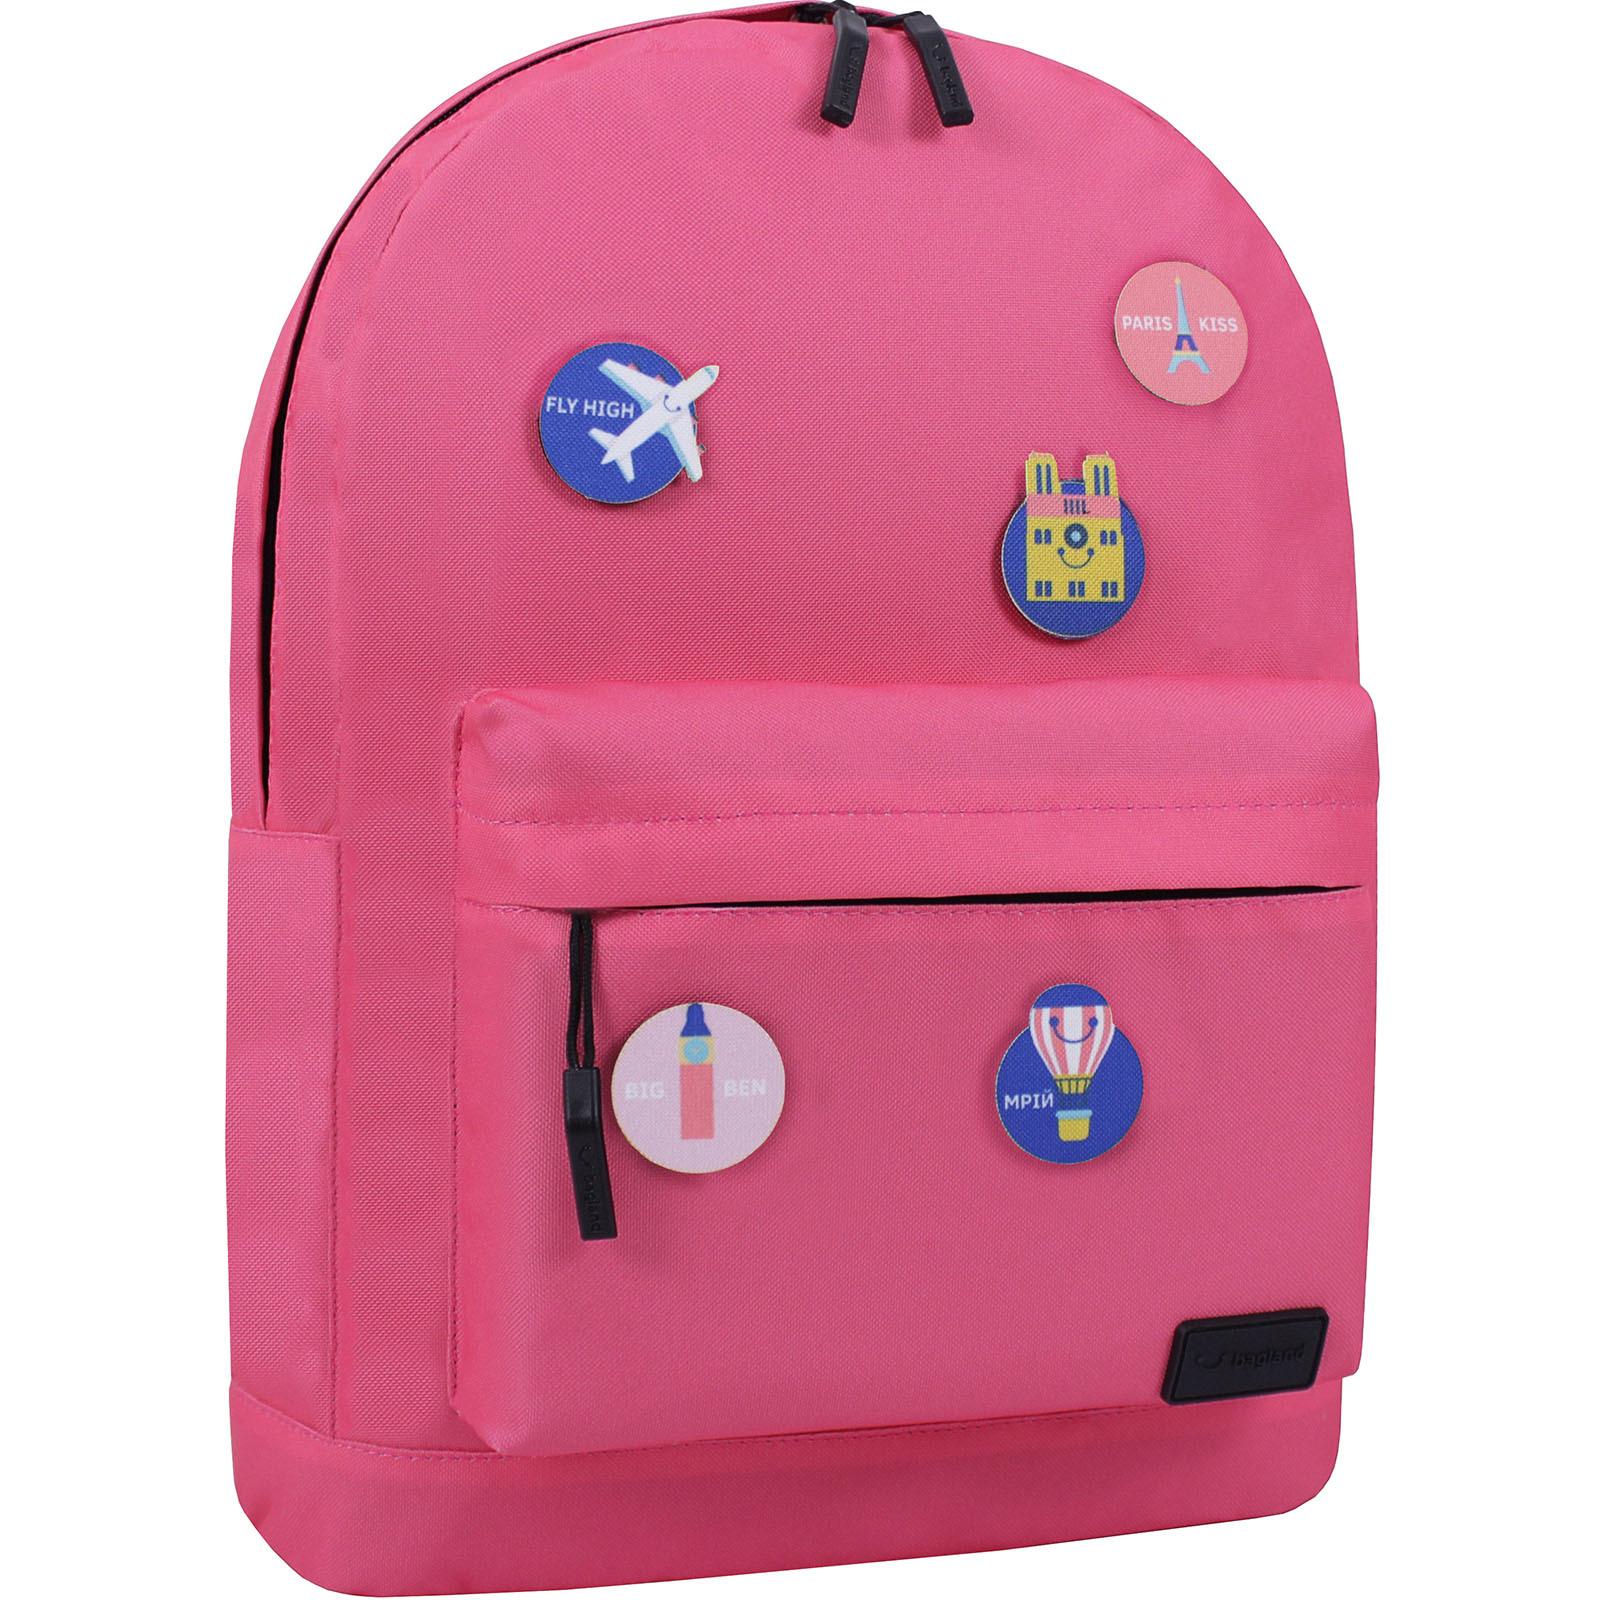 Рюкзак Bagland Молодежный W/R 17 л. Розовый (00533664 Ш) фото 2